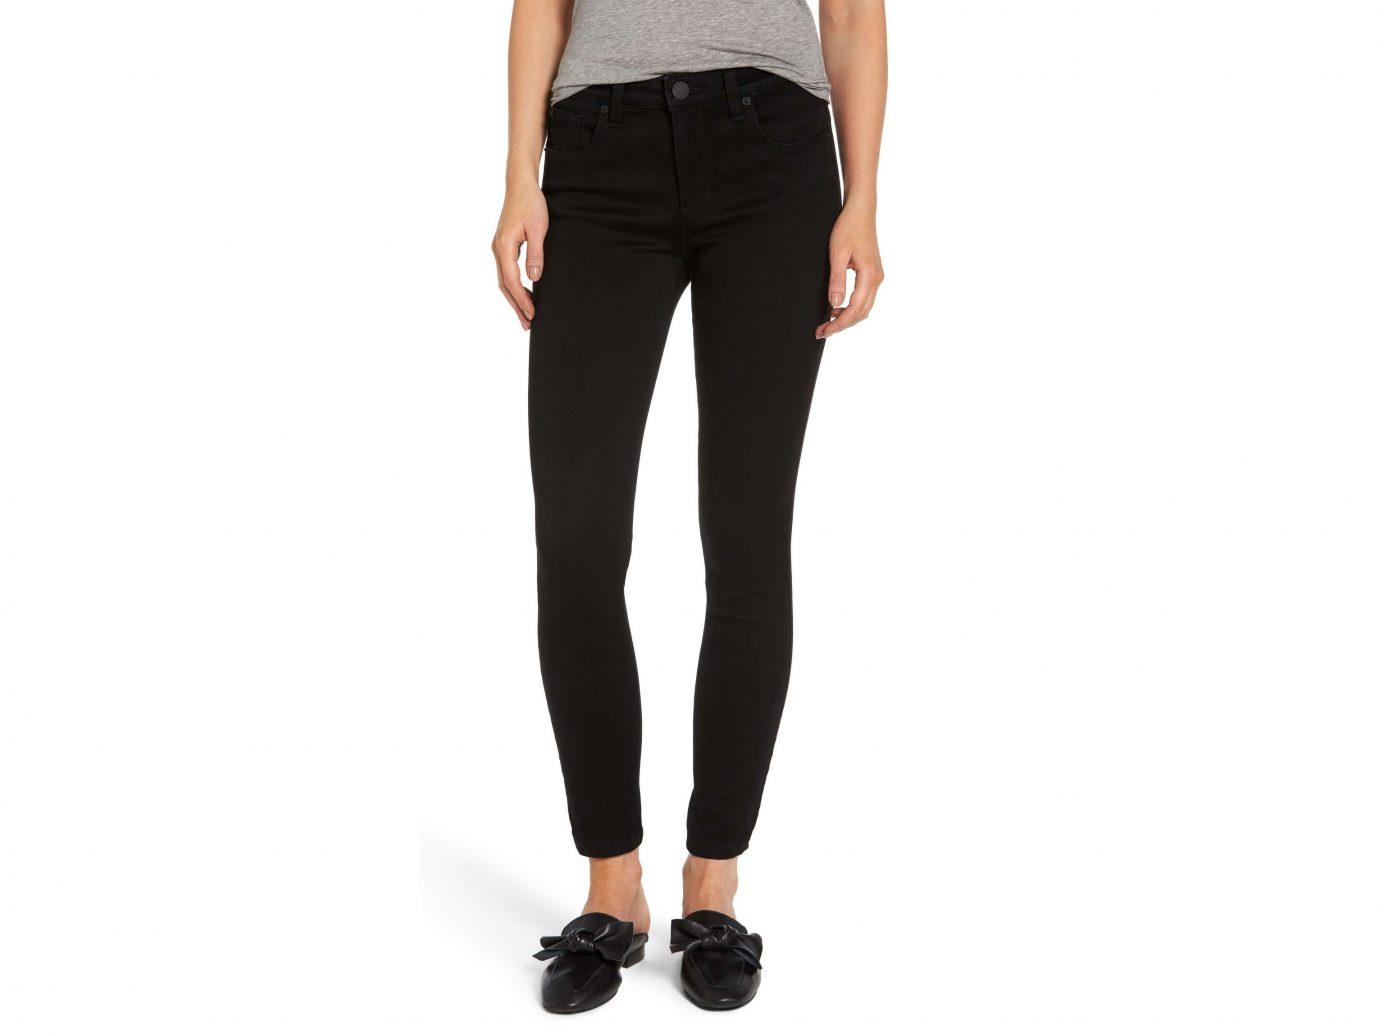 europe Hotels Prague clothing jeans person denim waist trouser joint trousers active pants leggings abdomen tights pocket posing